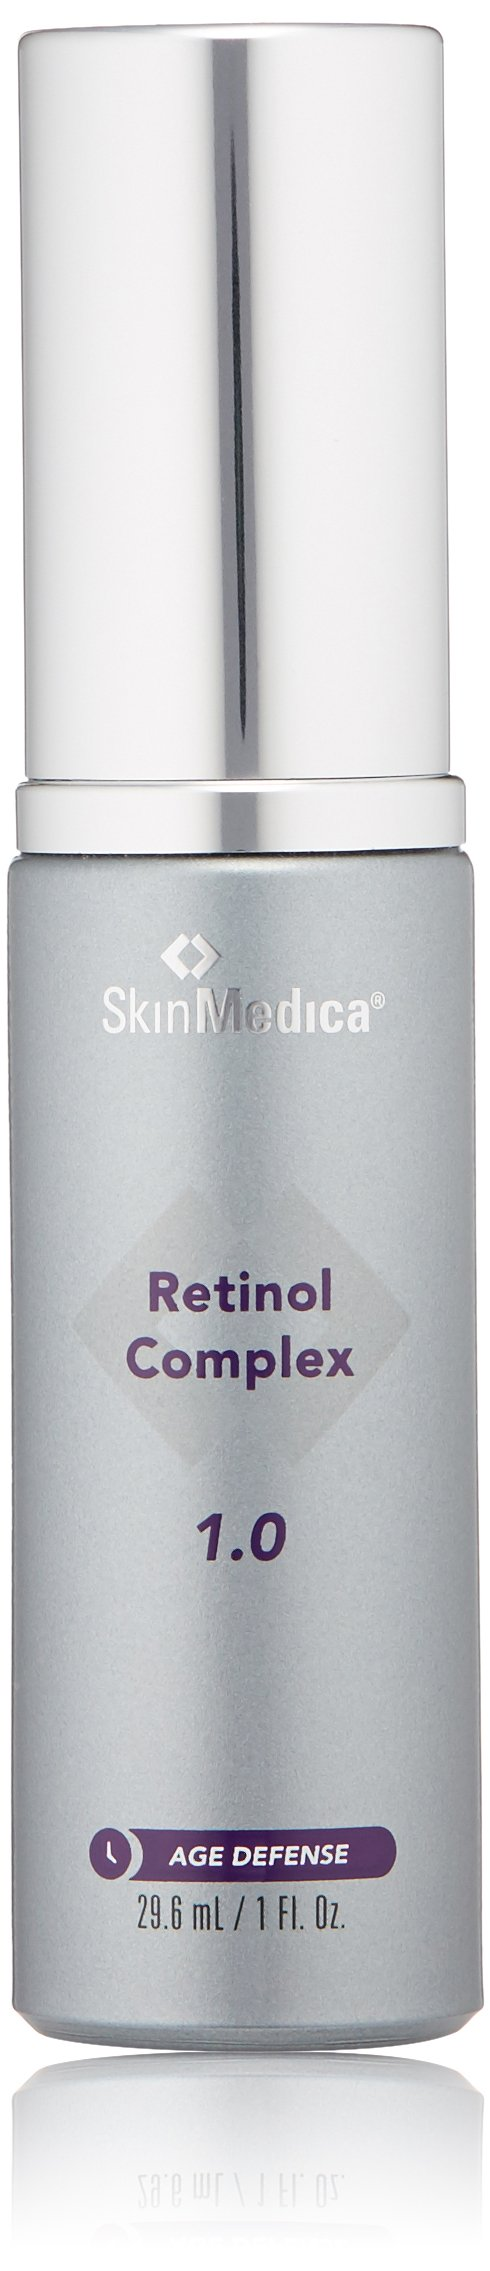 SkinMedica Retinol Complex, 1 Fl Oz by SkinMedica